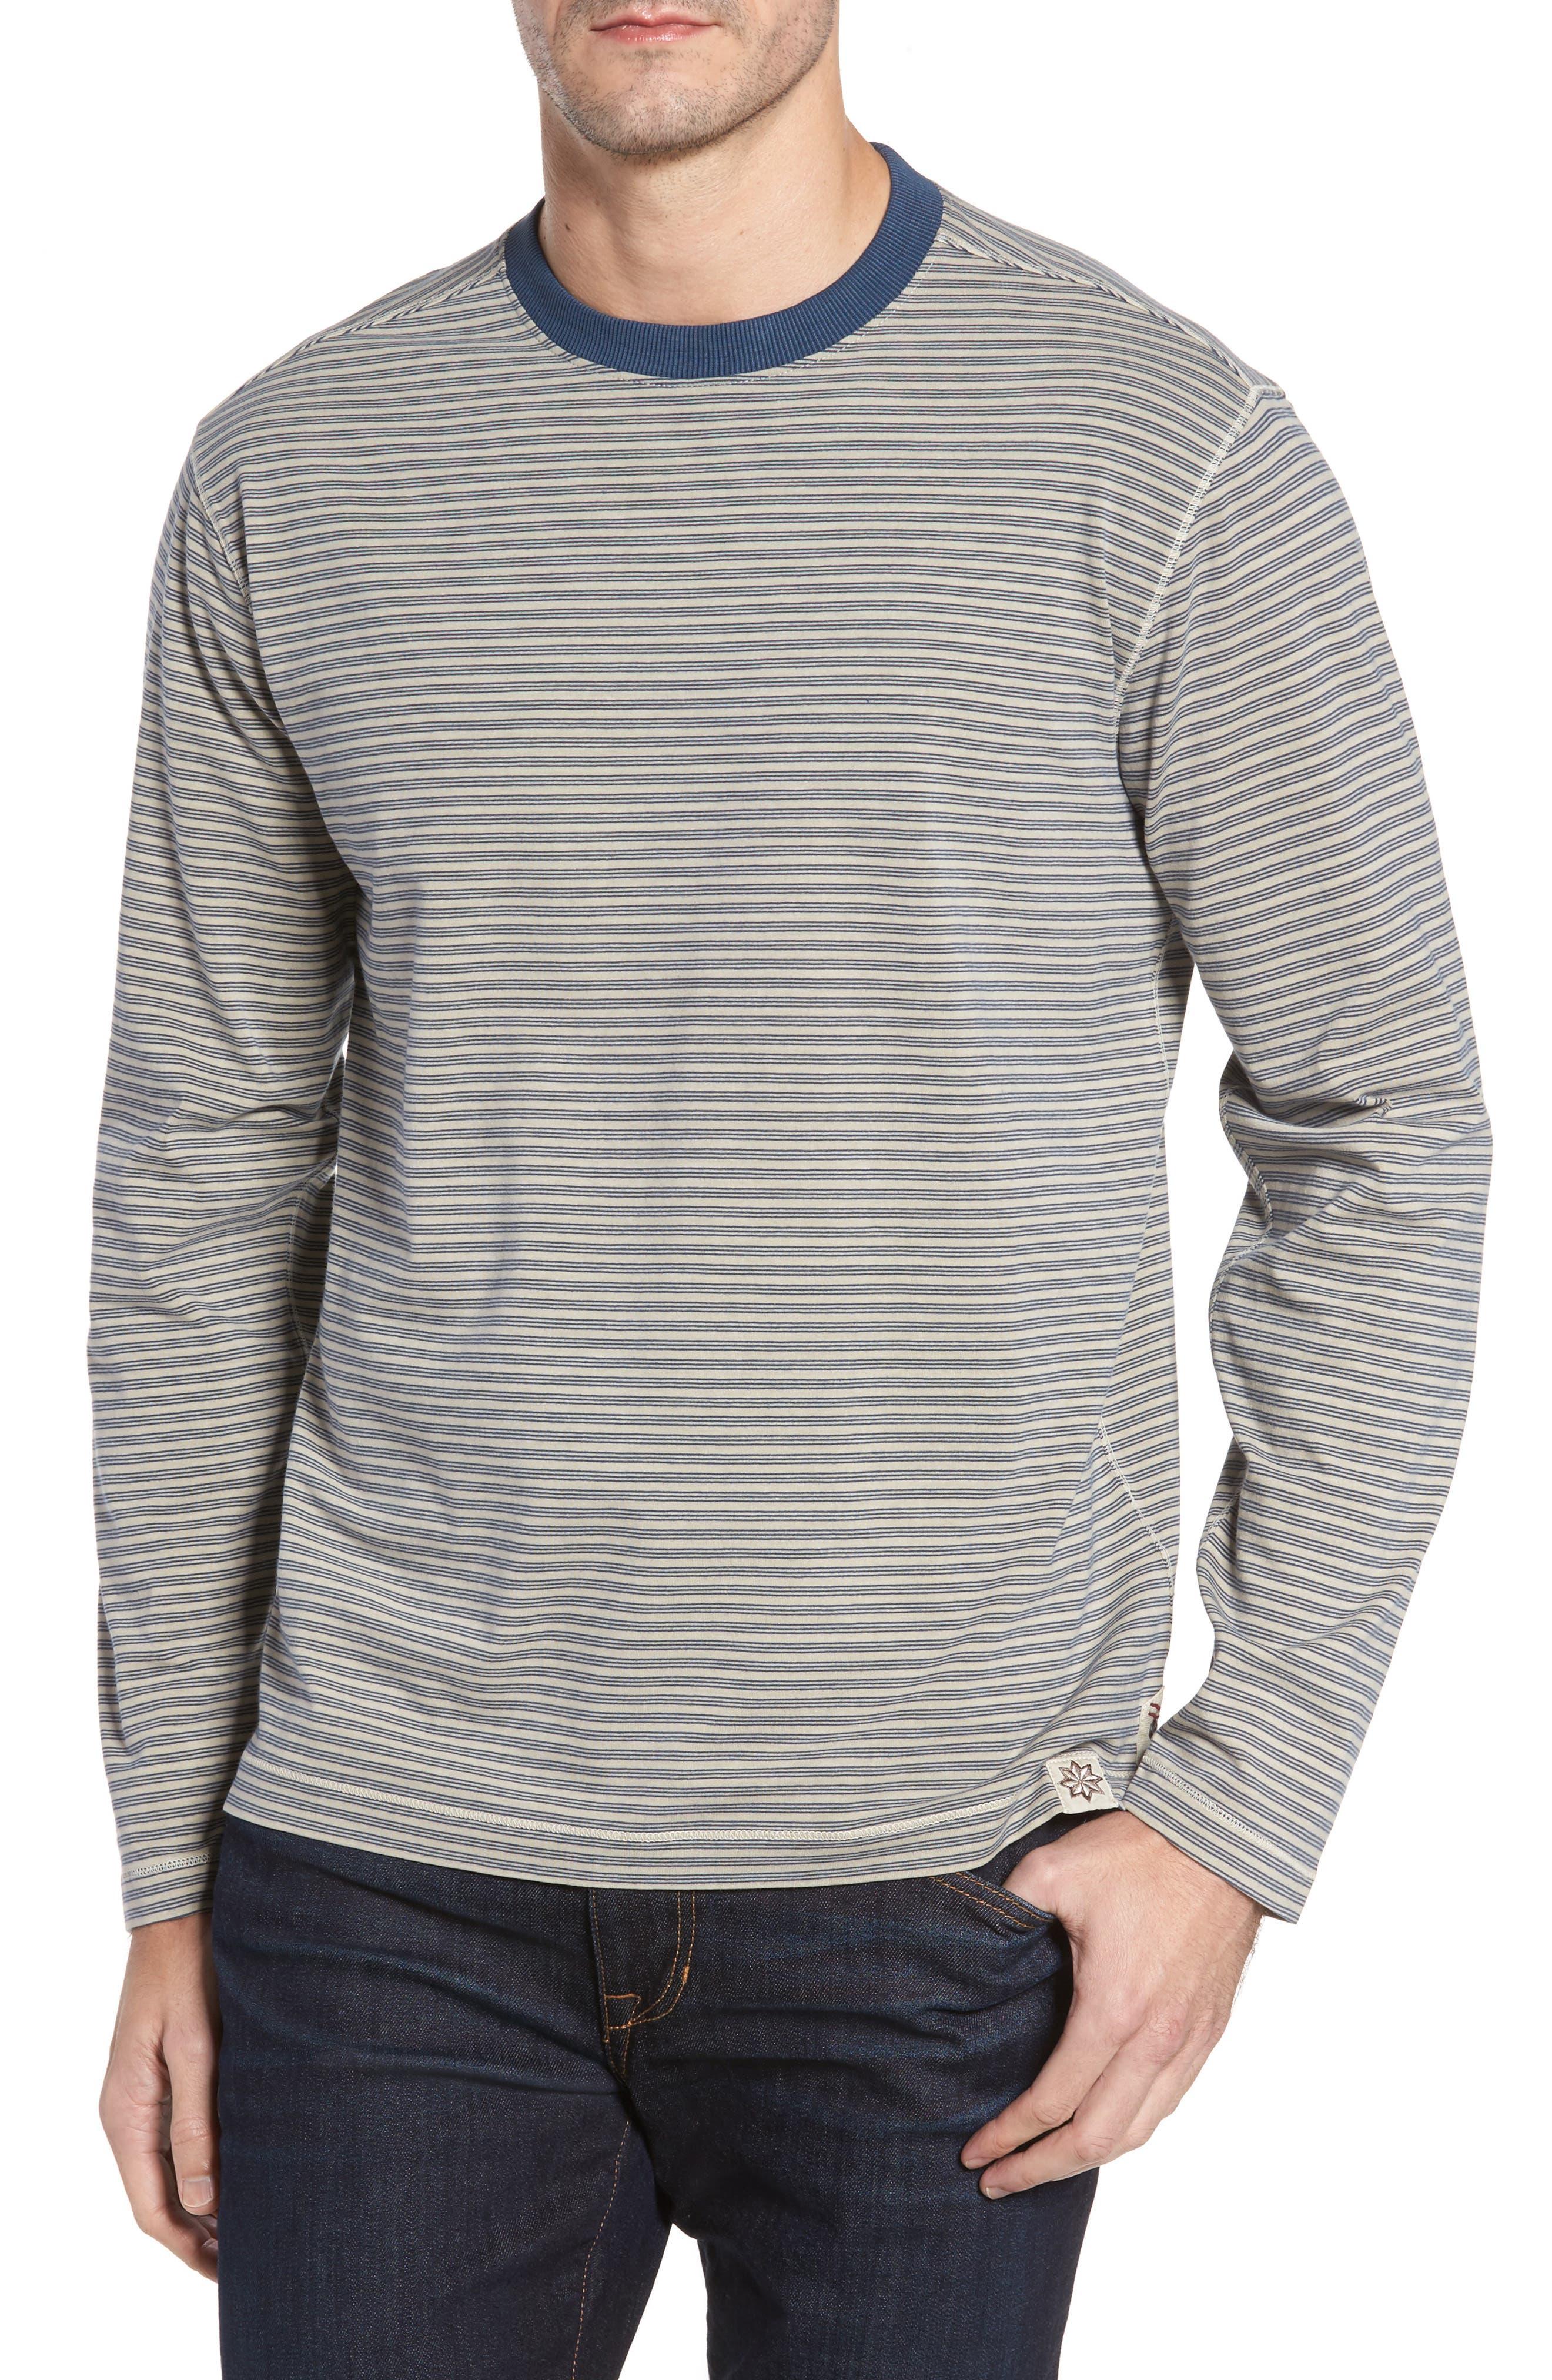 Iverson Long Sleeve Striped T-Shirt,                             Main thumbnail 1, color,                             290